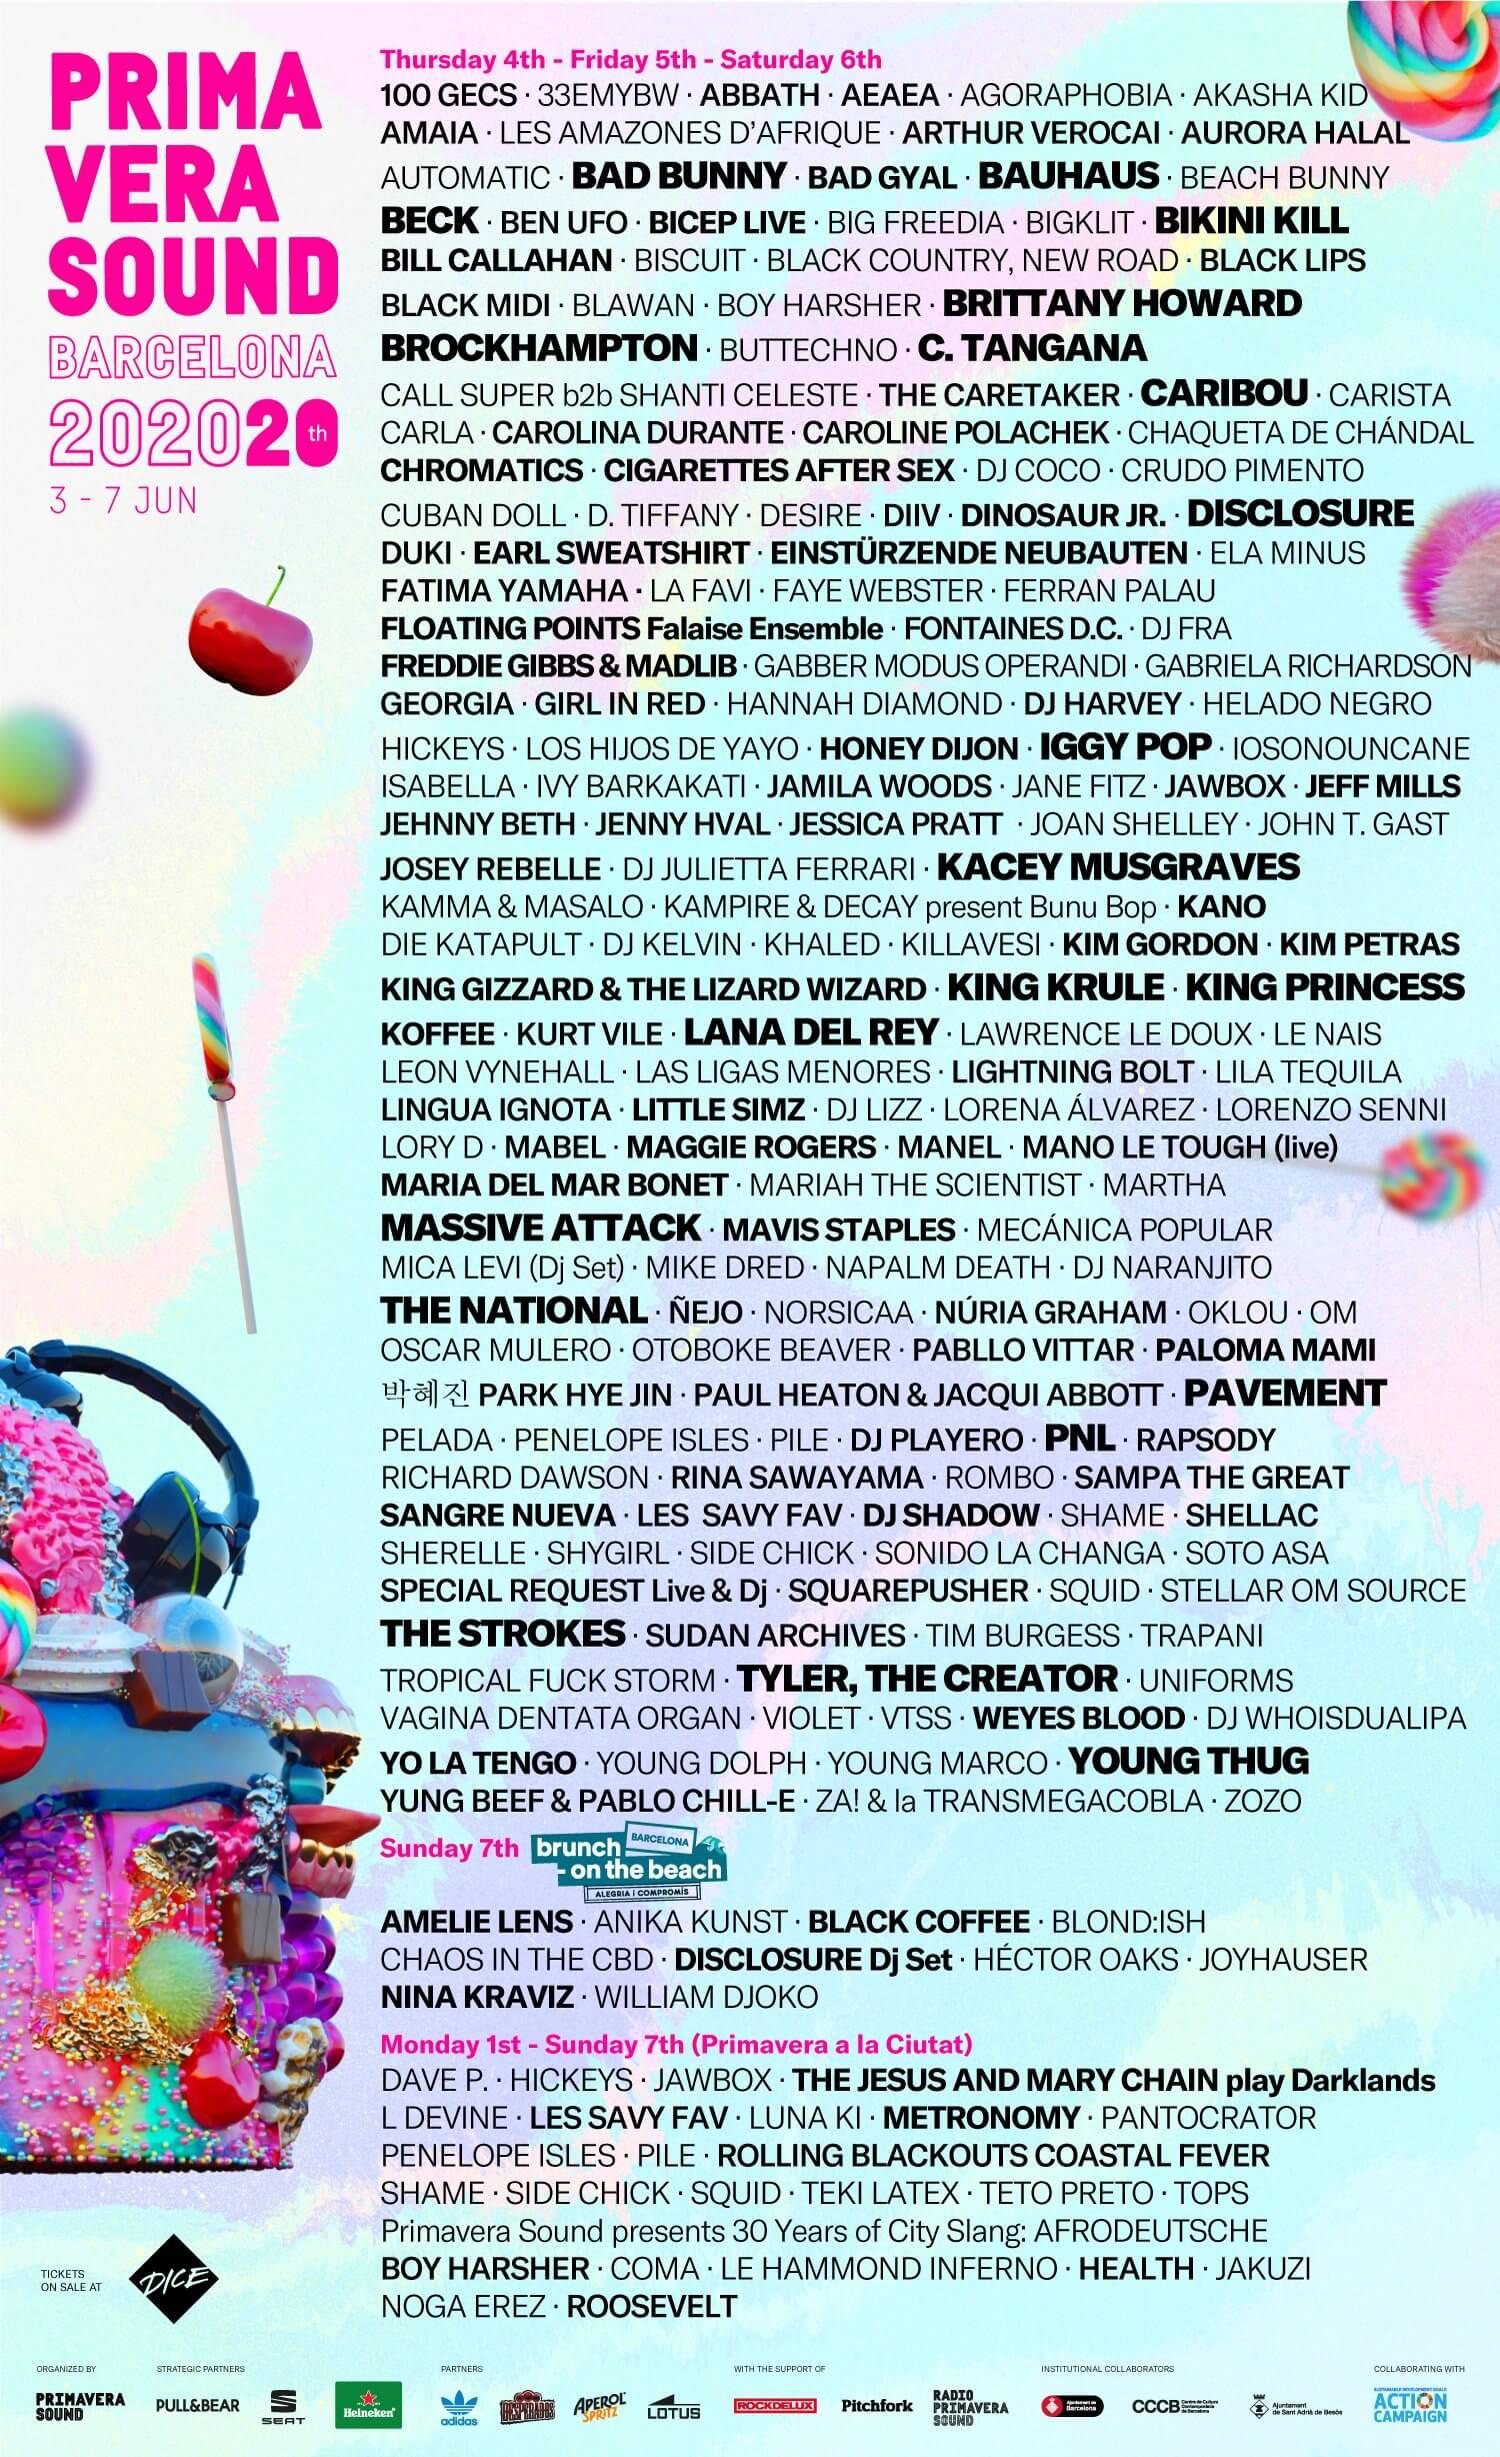 Line-up do Primavera Sound 2020